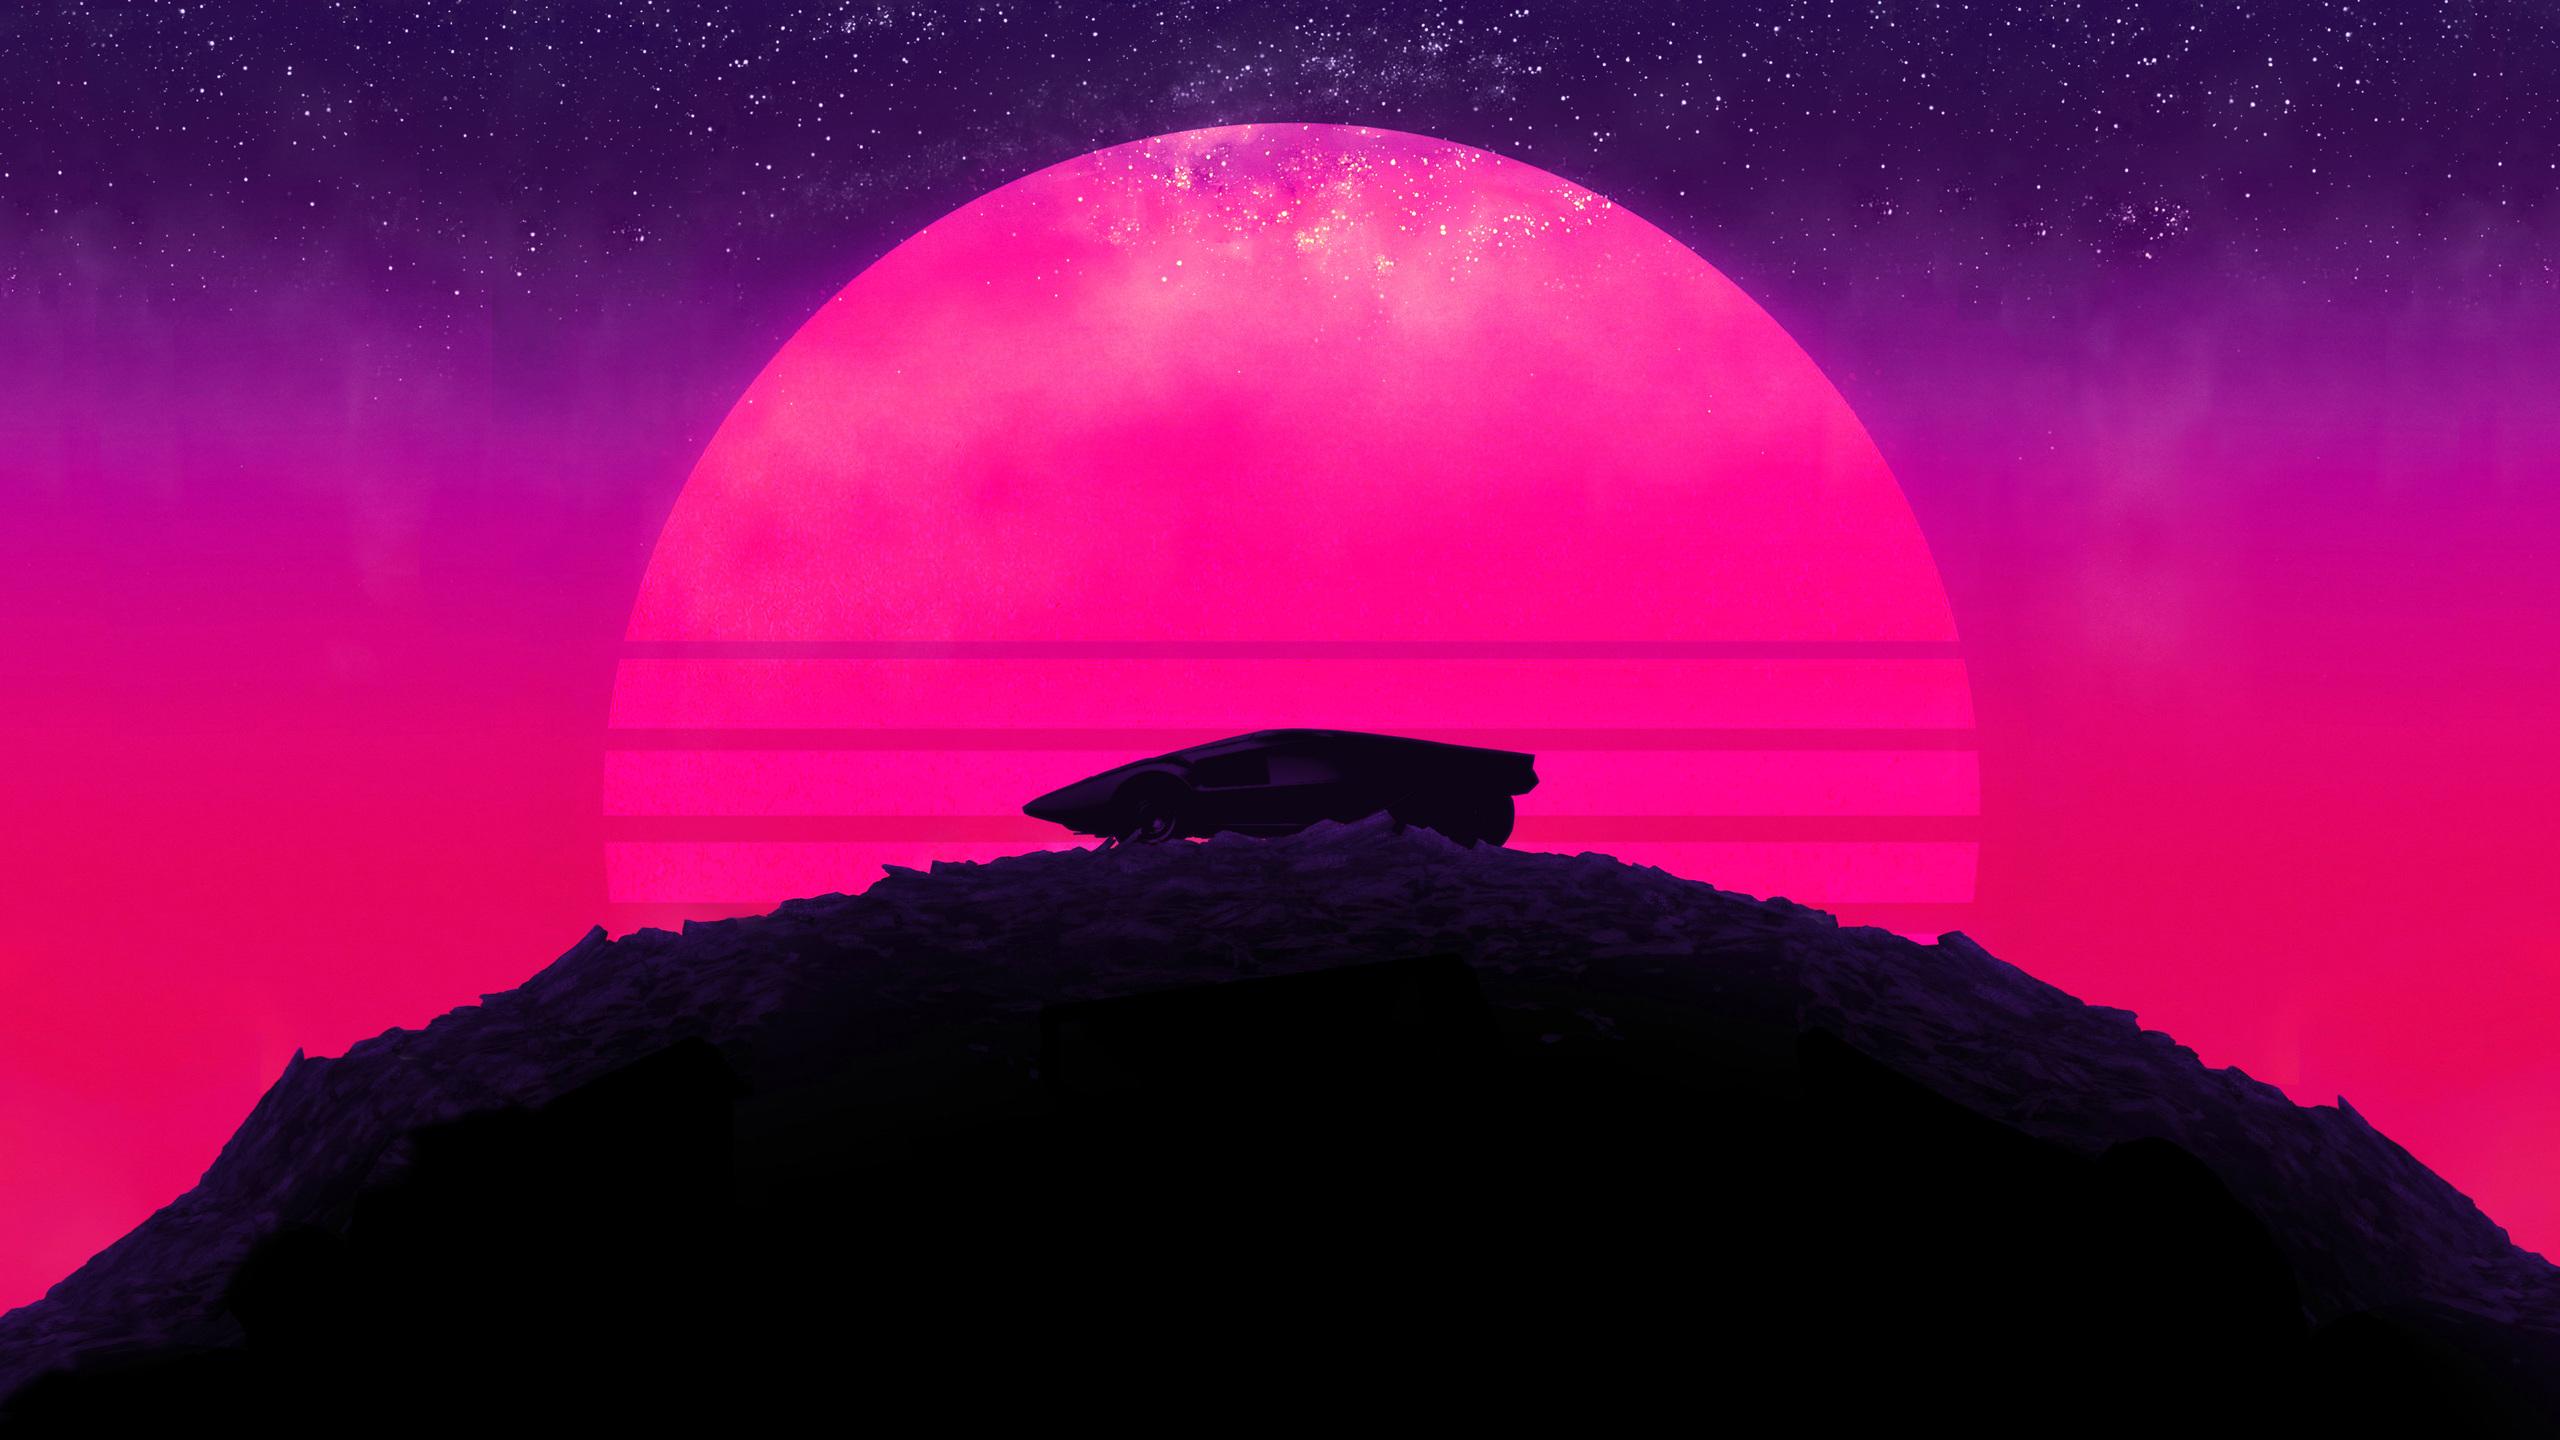 2560x1440 Future Sports Car Neon Sunset Background 4k ...